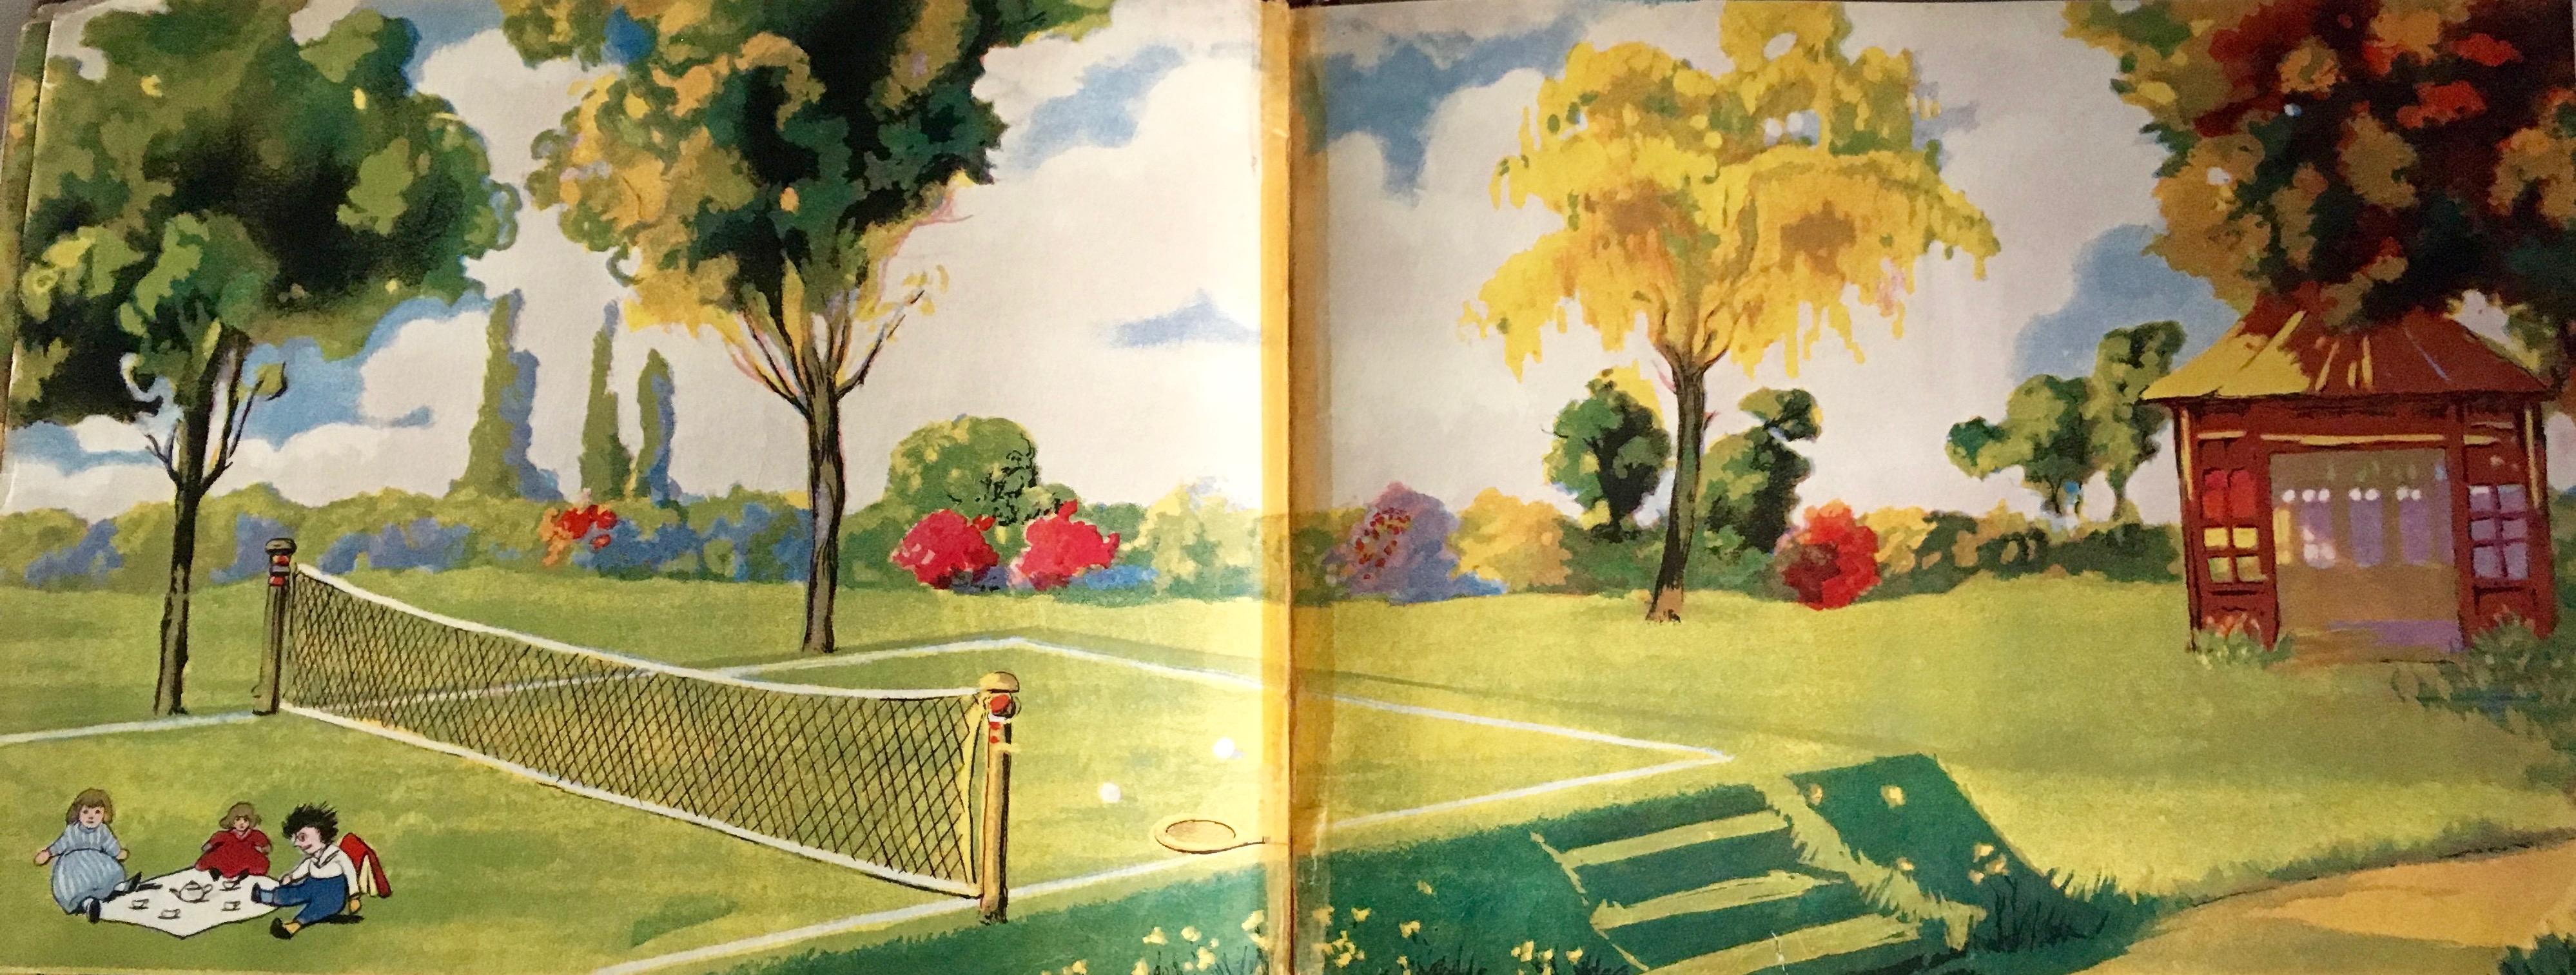 tennis lawn